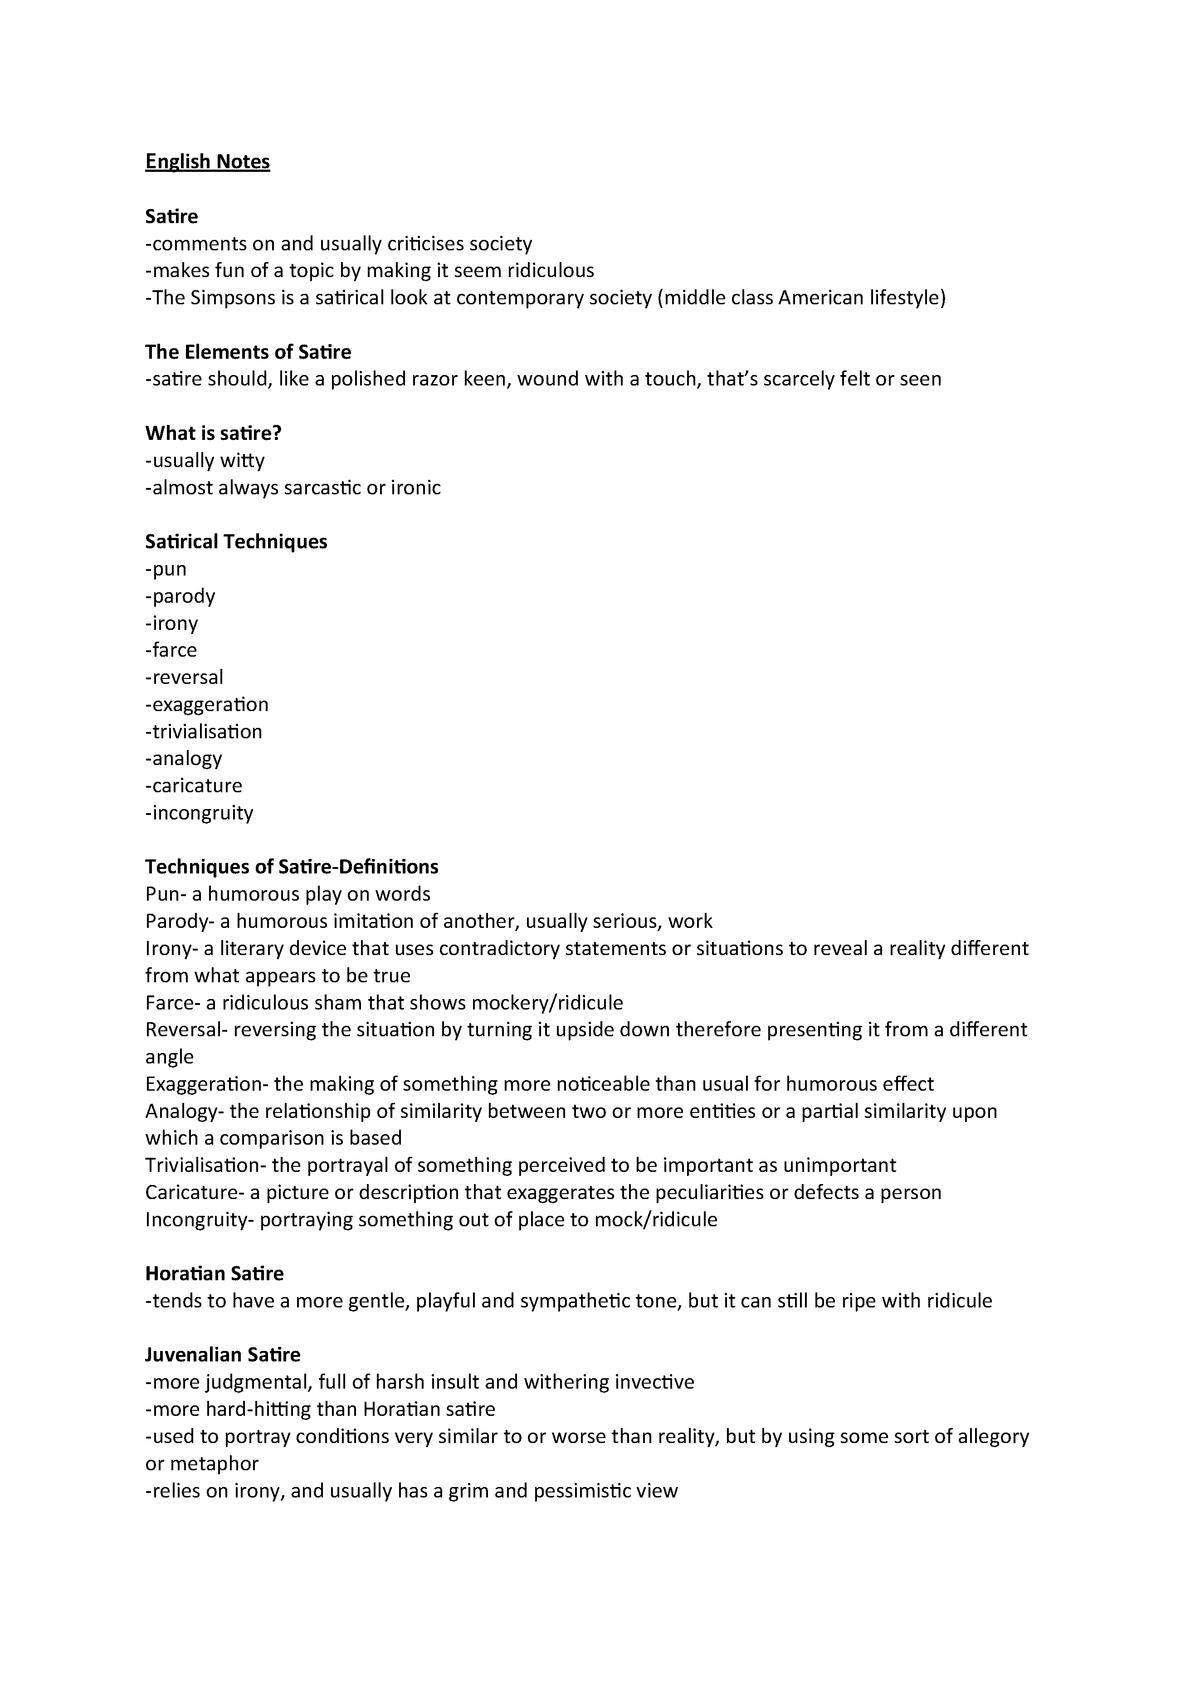 English Notes Term 1 Summary The Great Gatsby Llb301 Studocu